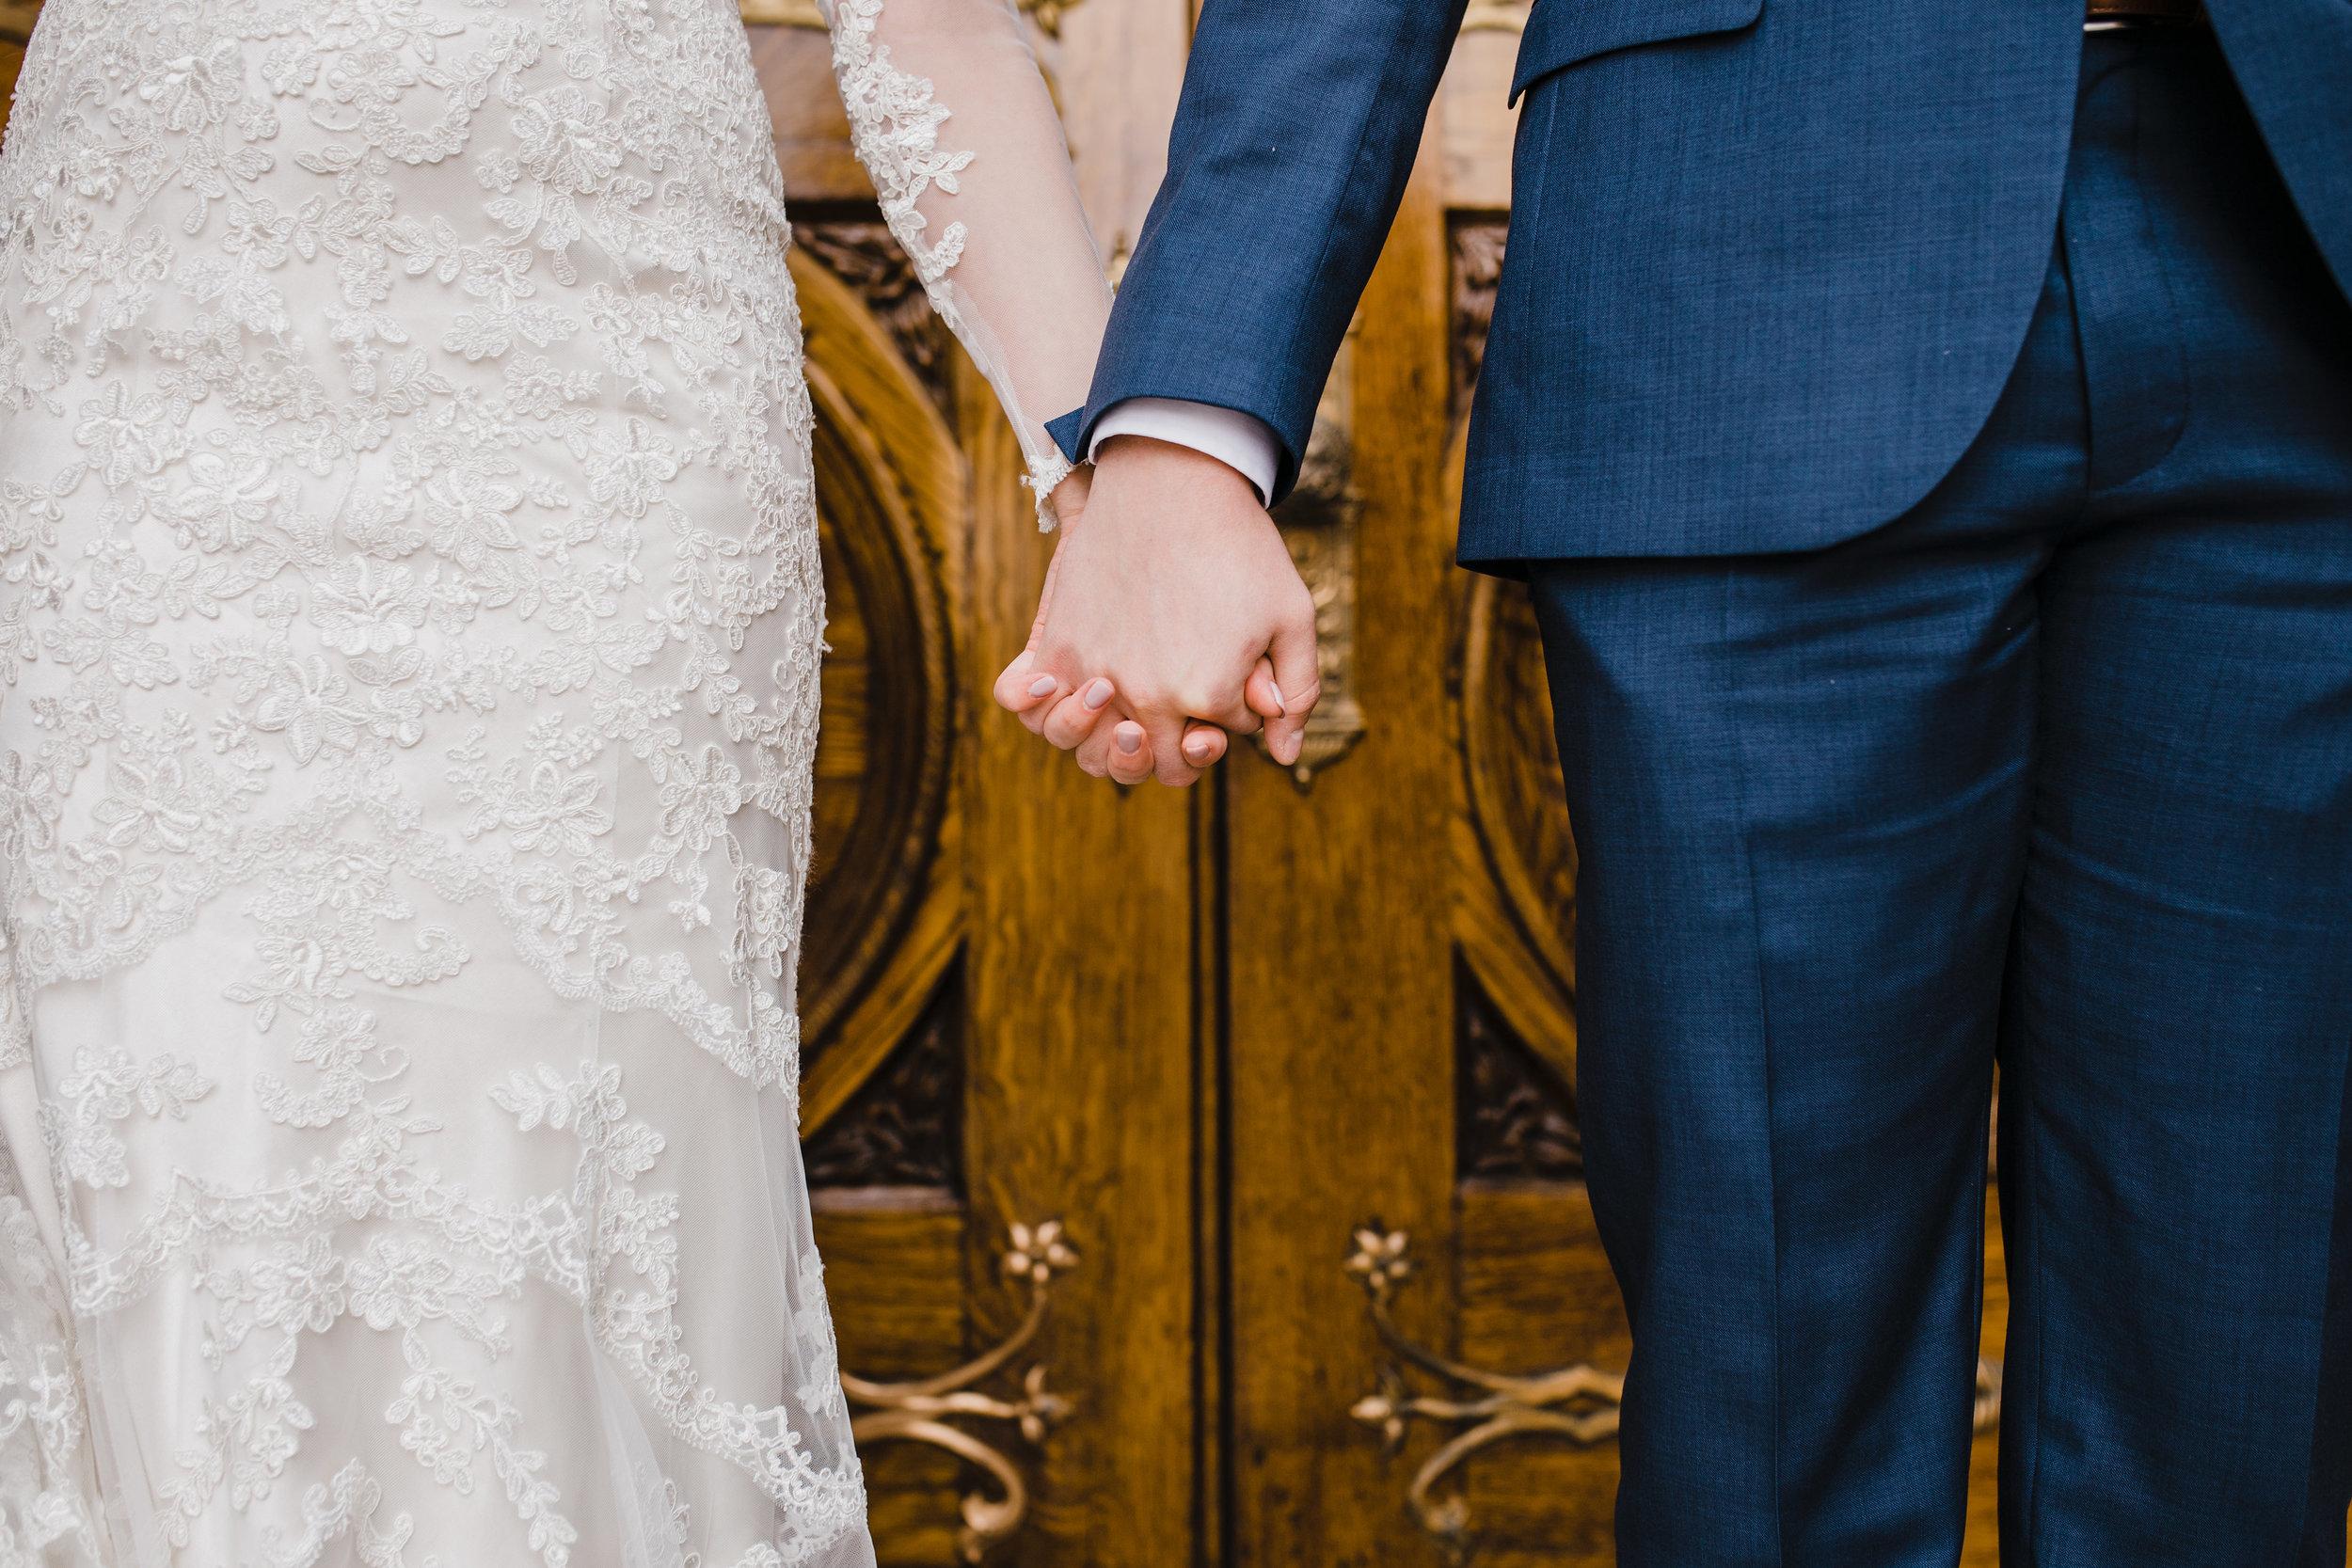 Best professional photographer in lakewood colorado lds temple wedding lace dress holding hands wooden door